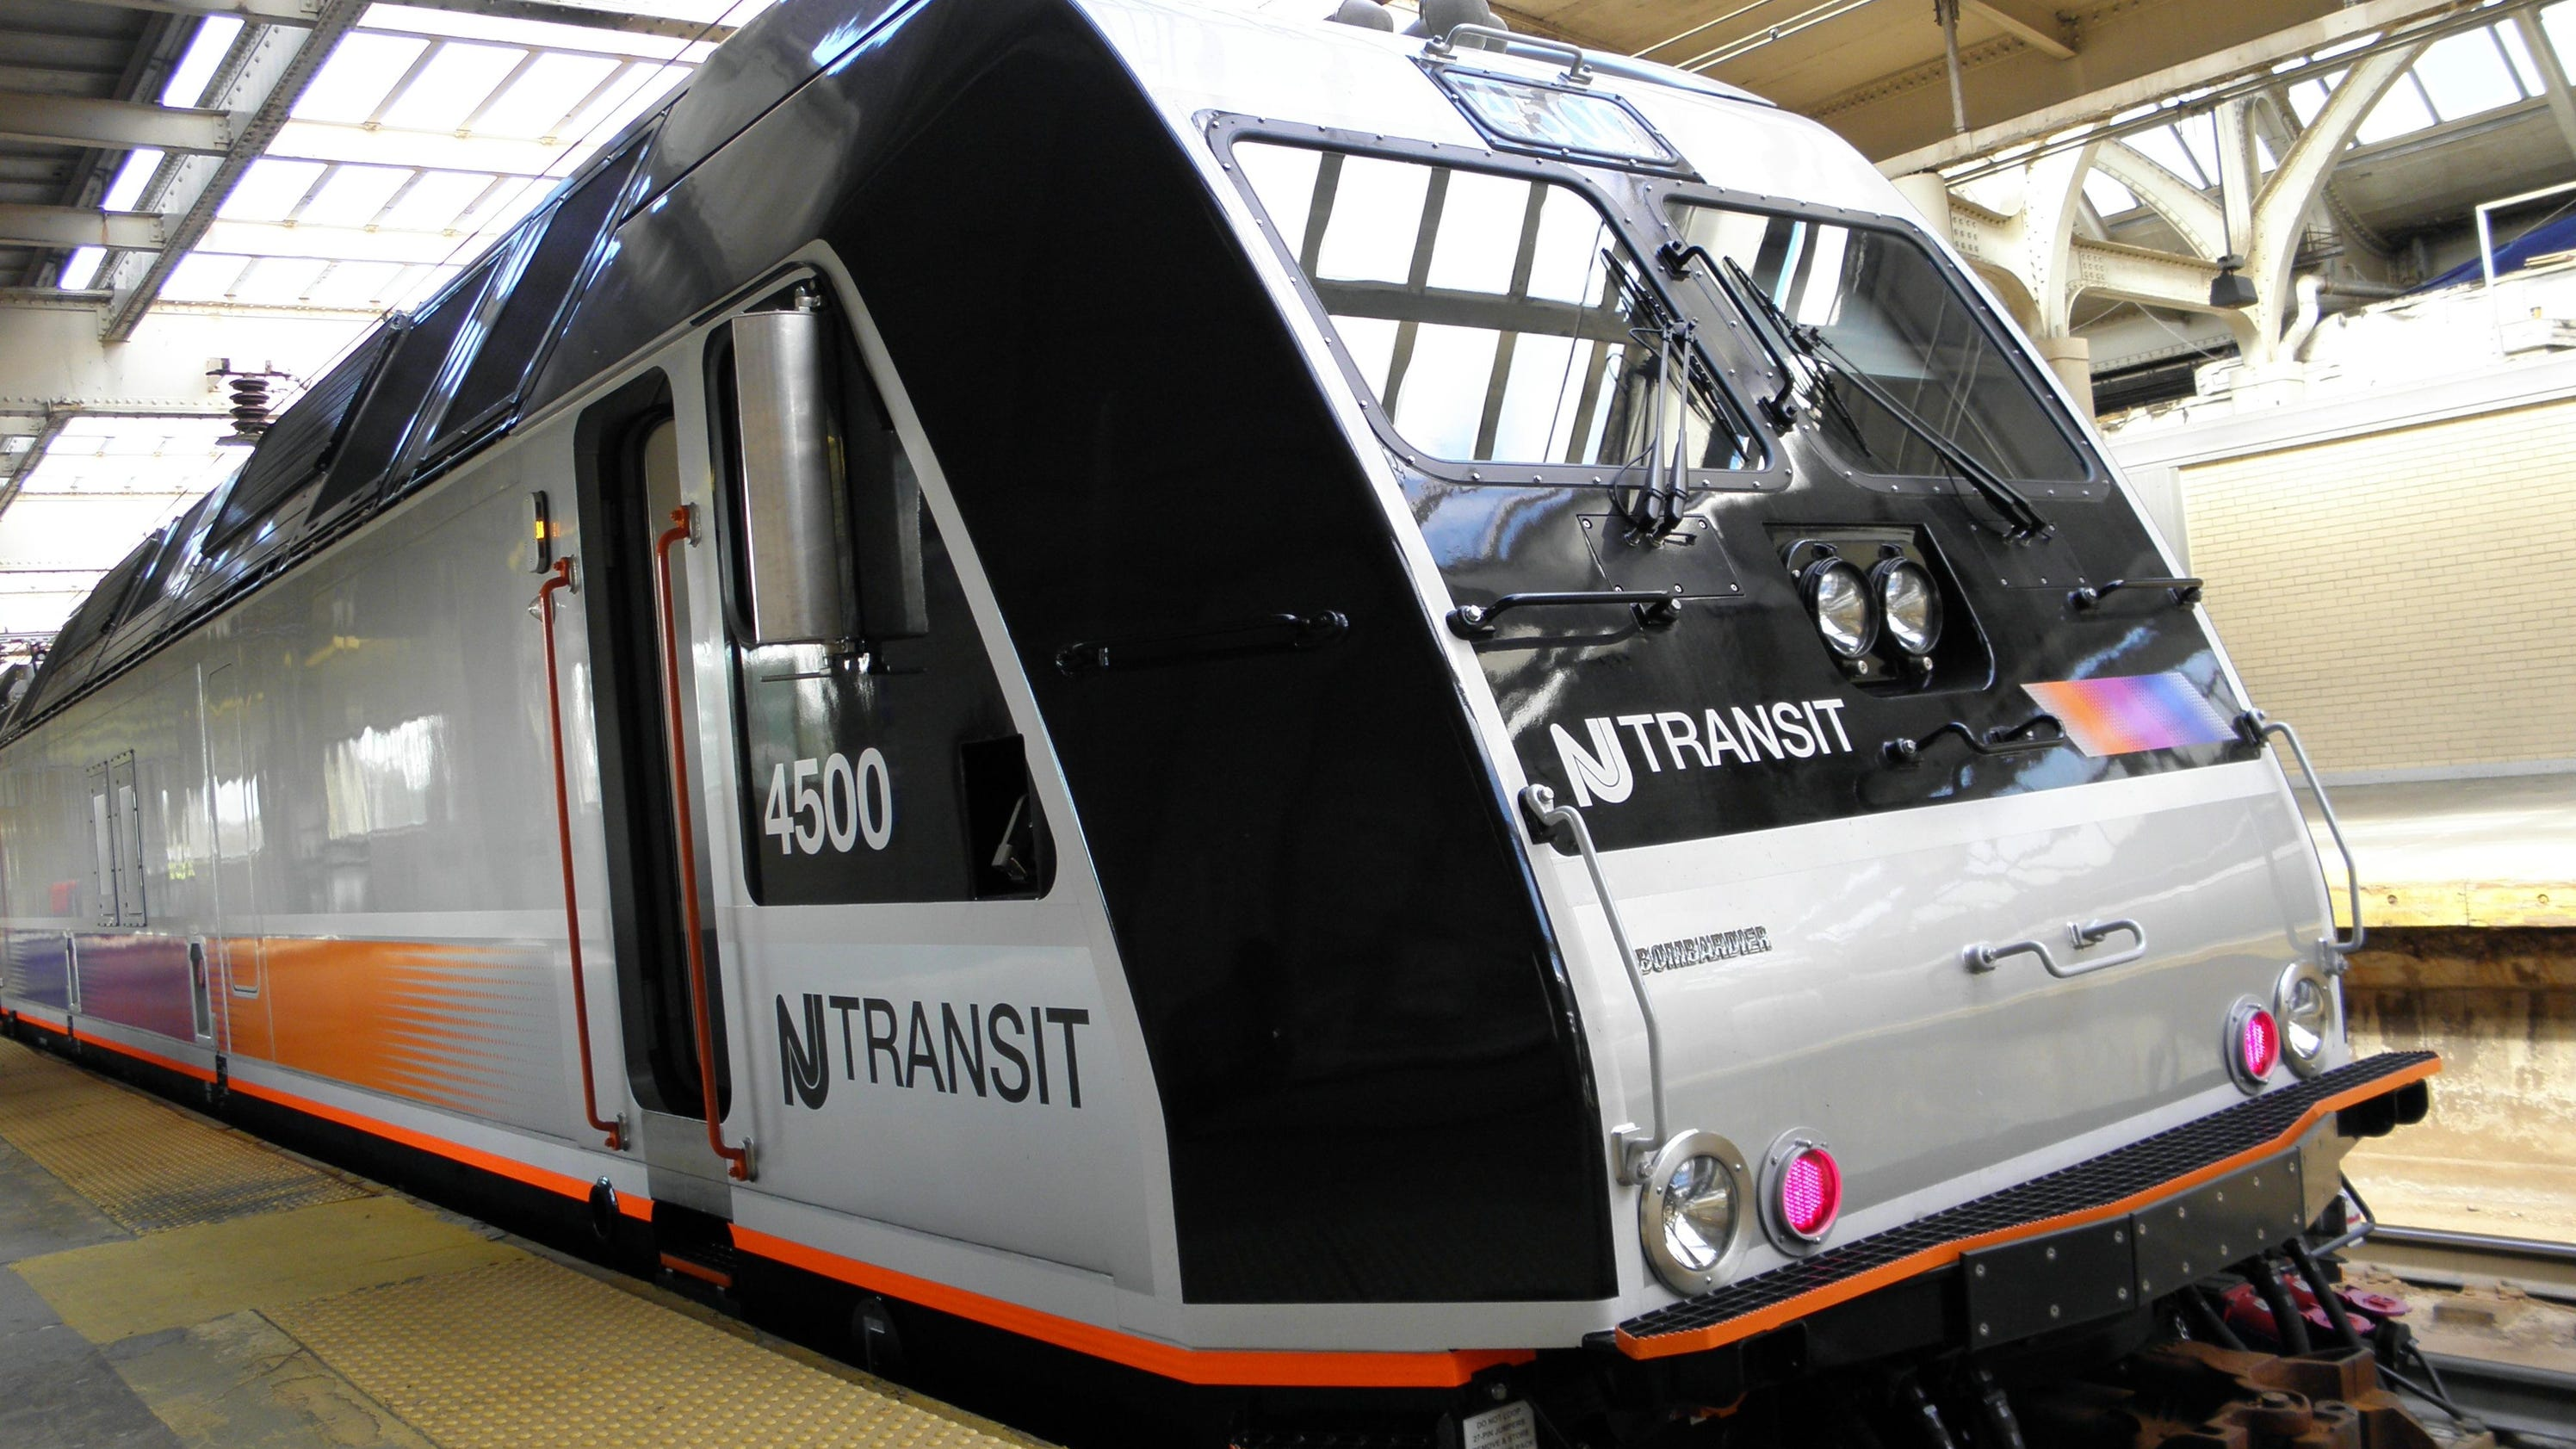 NJ Transit Gladstone branch rail service to resume following